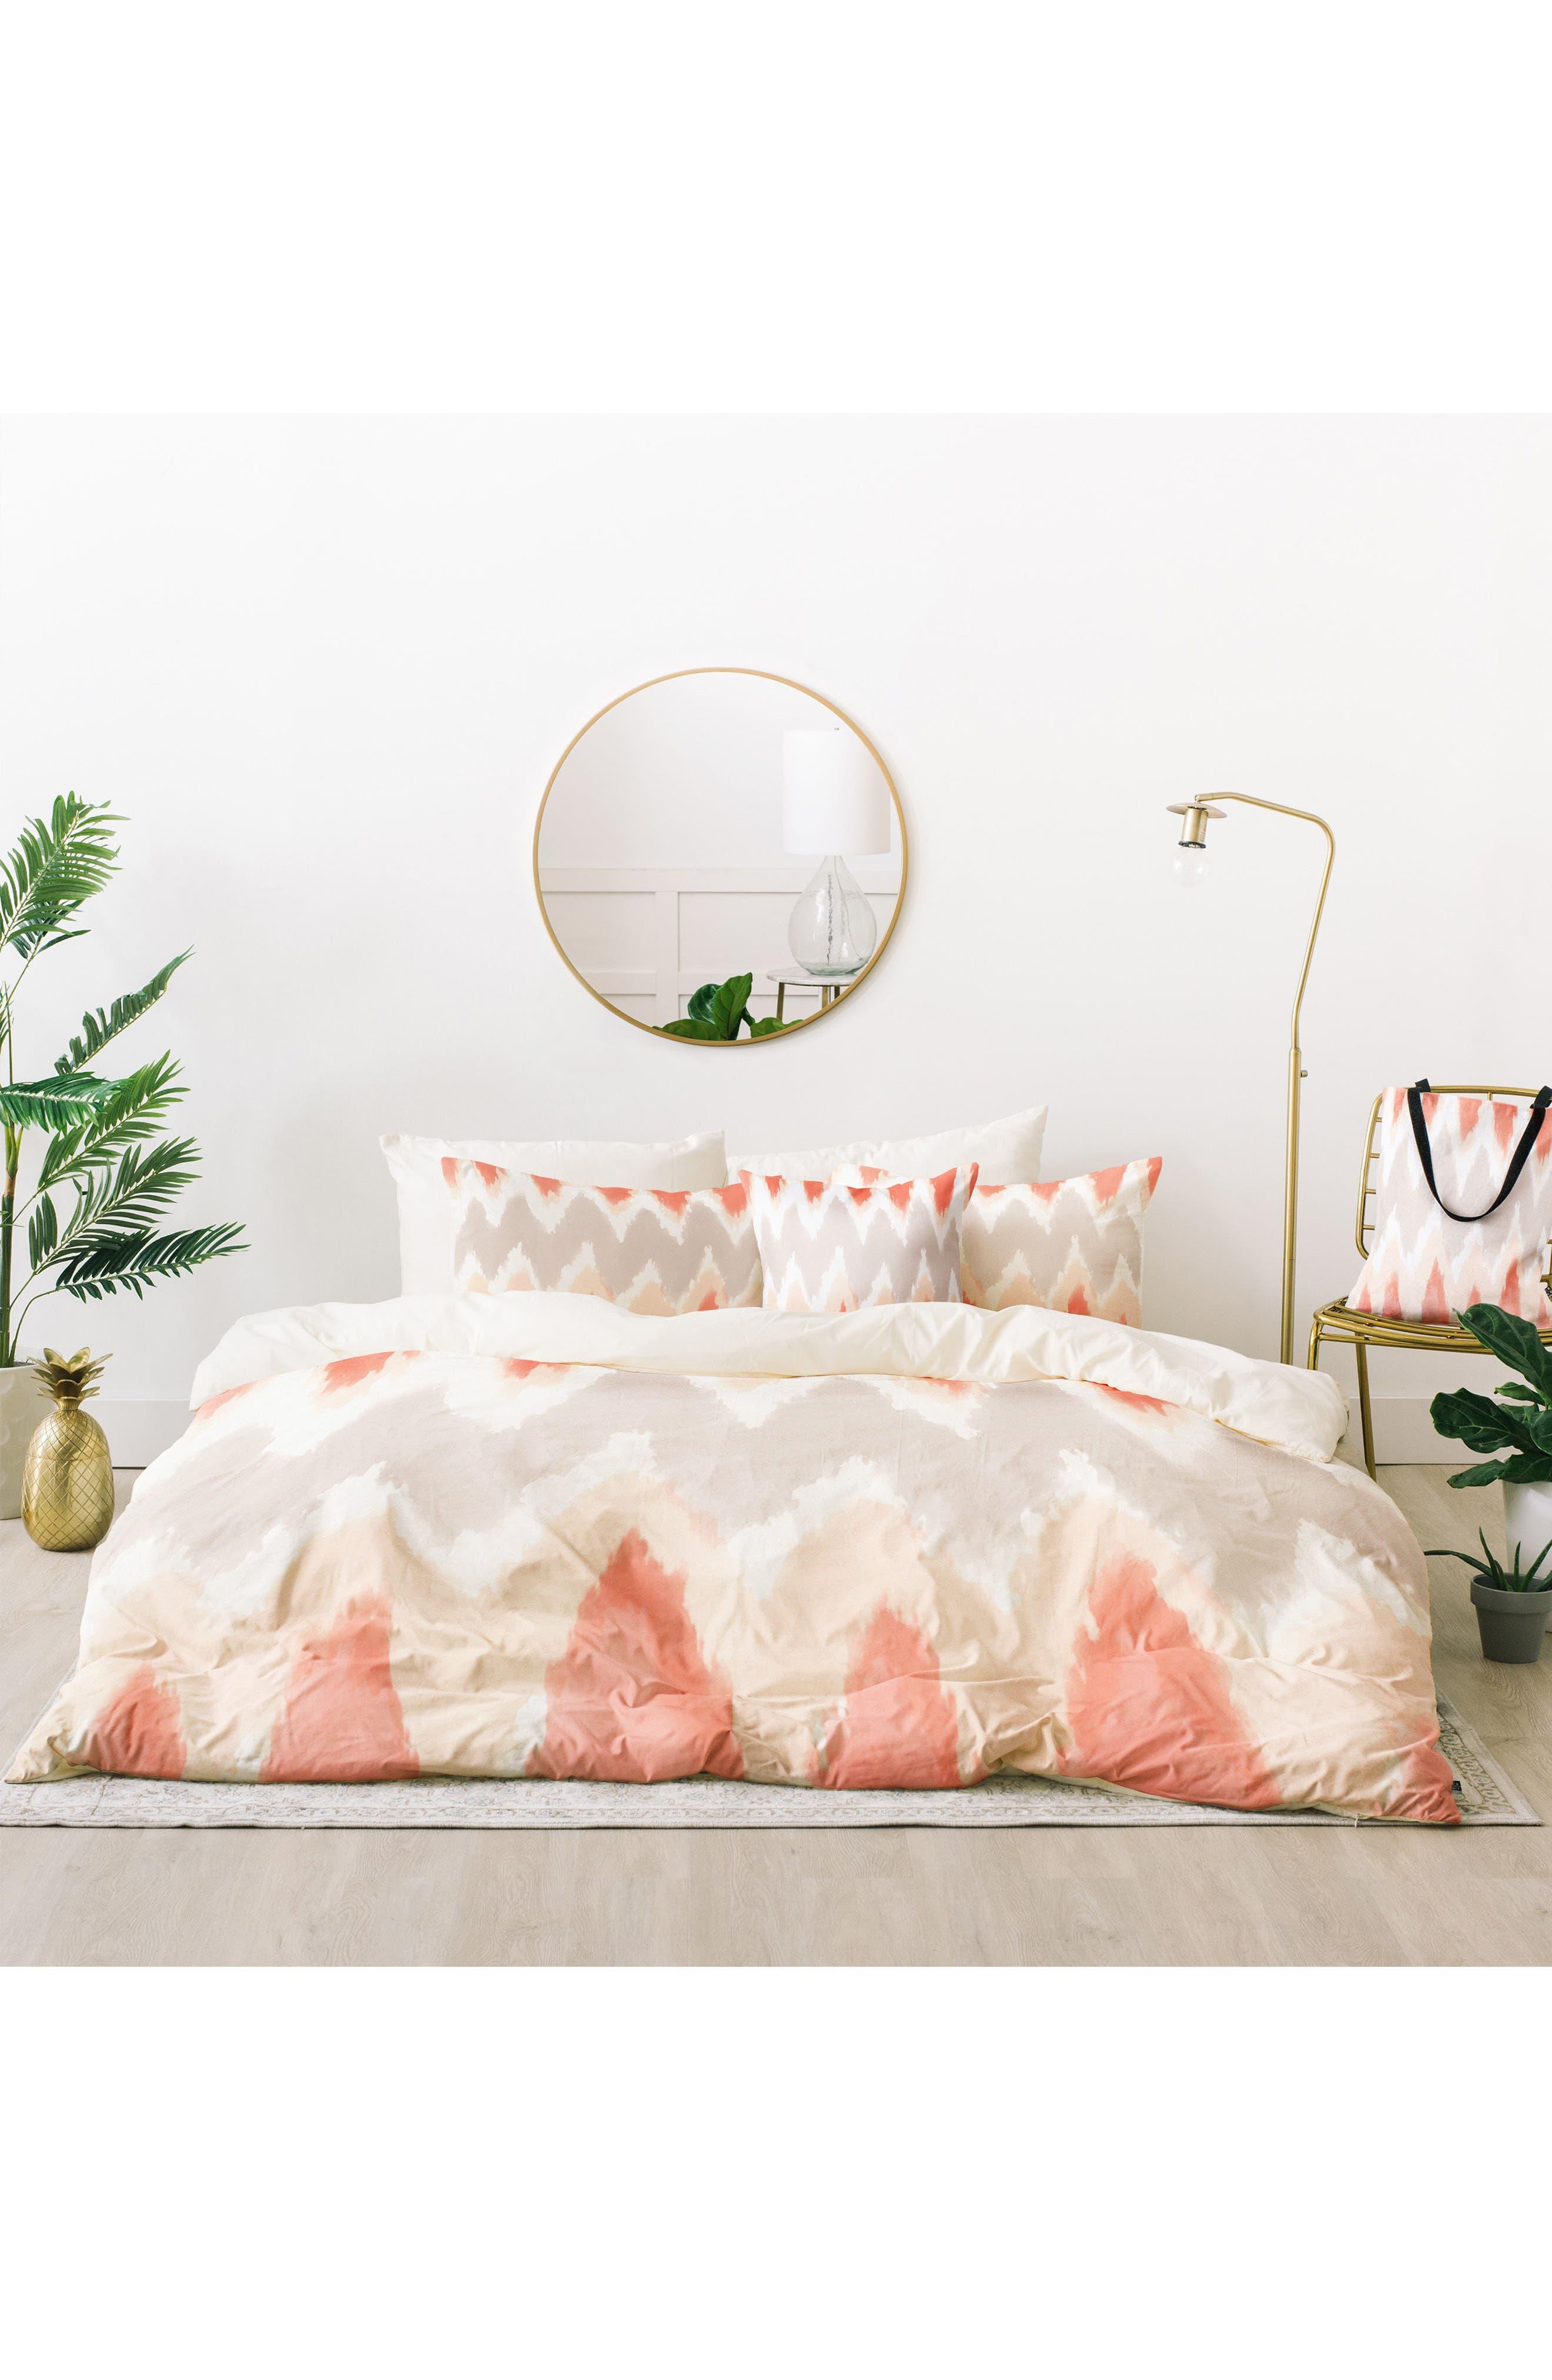 DENY DESIGNS,                             Zoe Wodarz Zigzagzig Bed in a Bag Duvet Cover, Sham & Accent Pillow Set,                             Main thumbnail 1, color,                             250